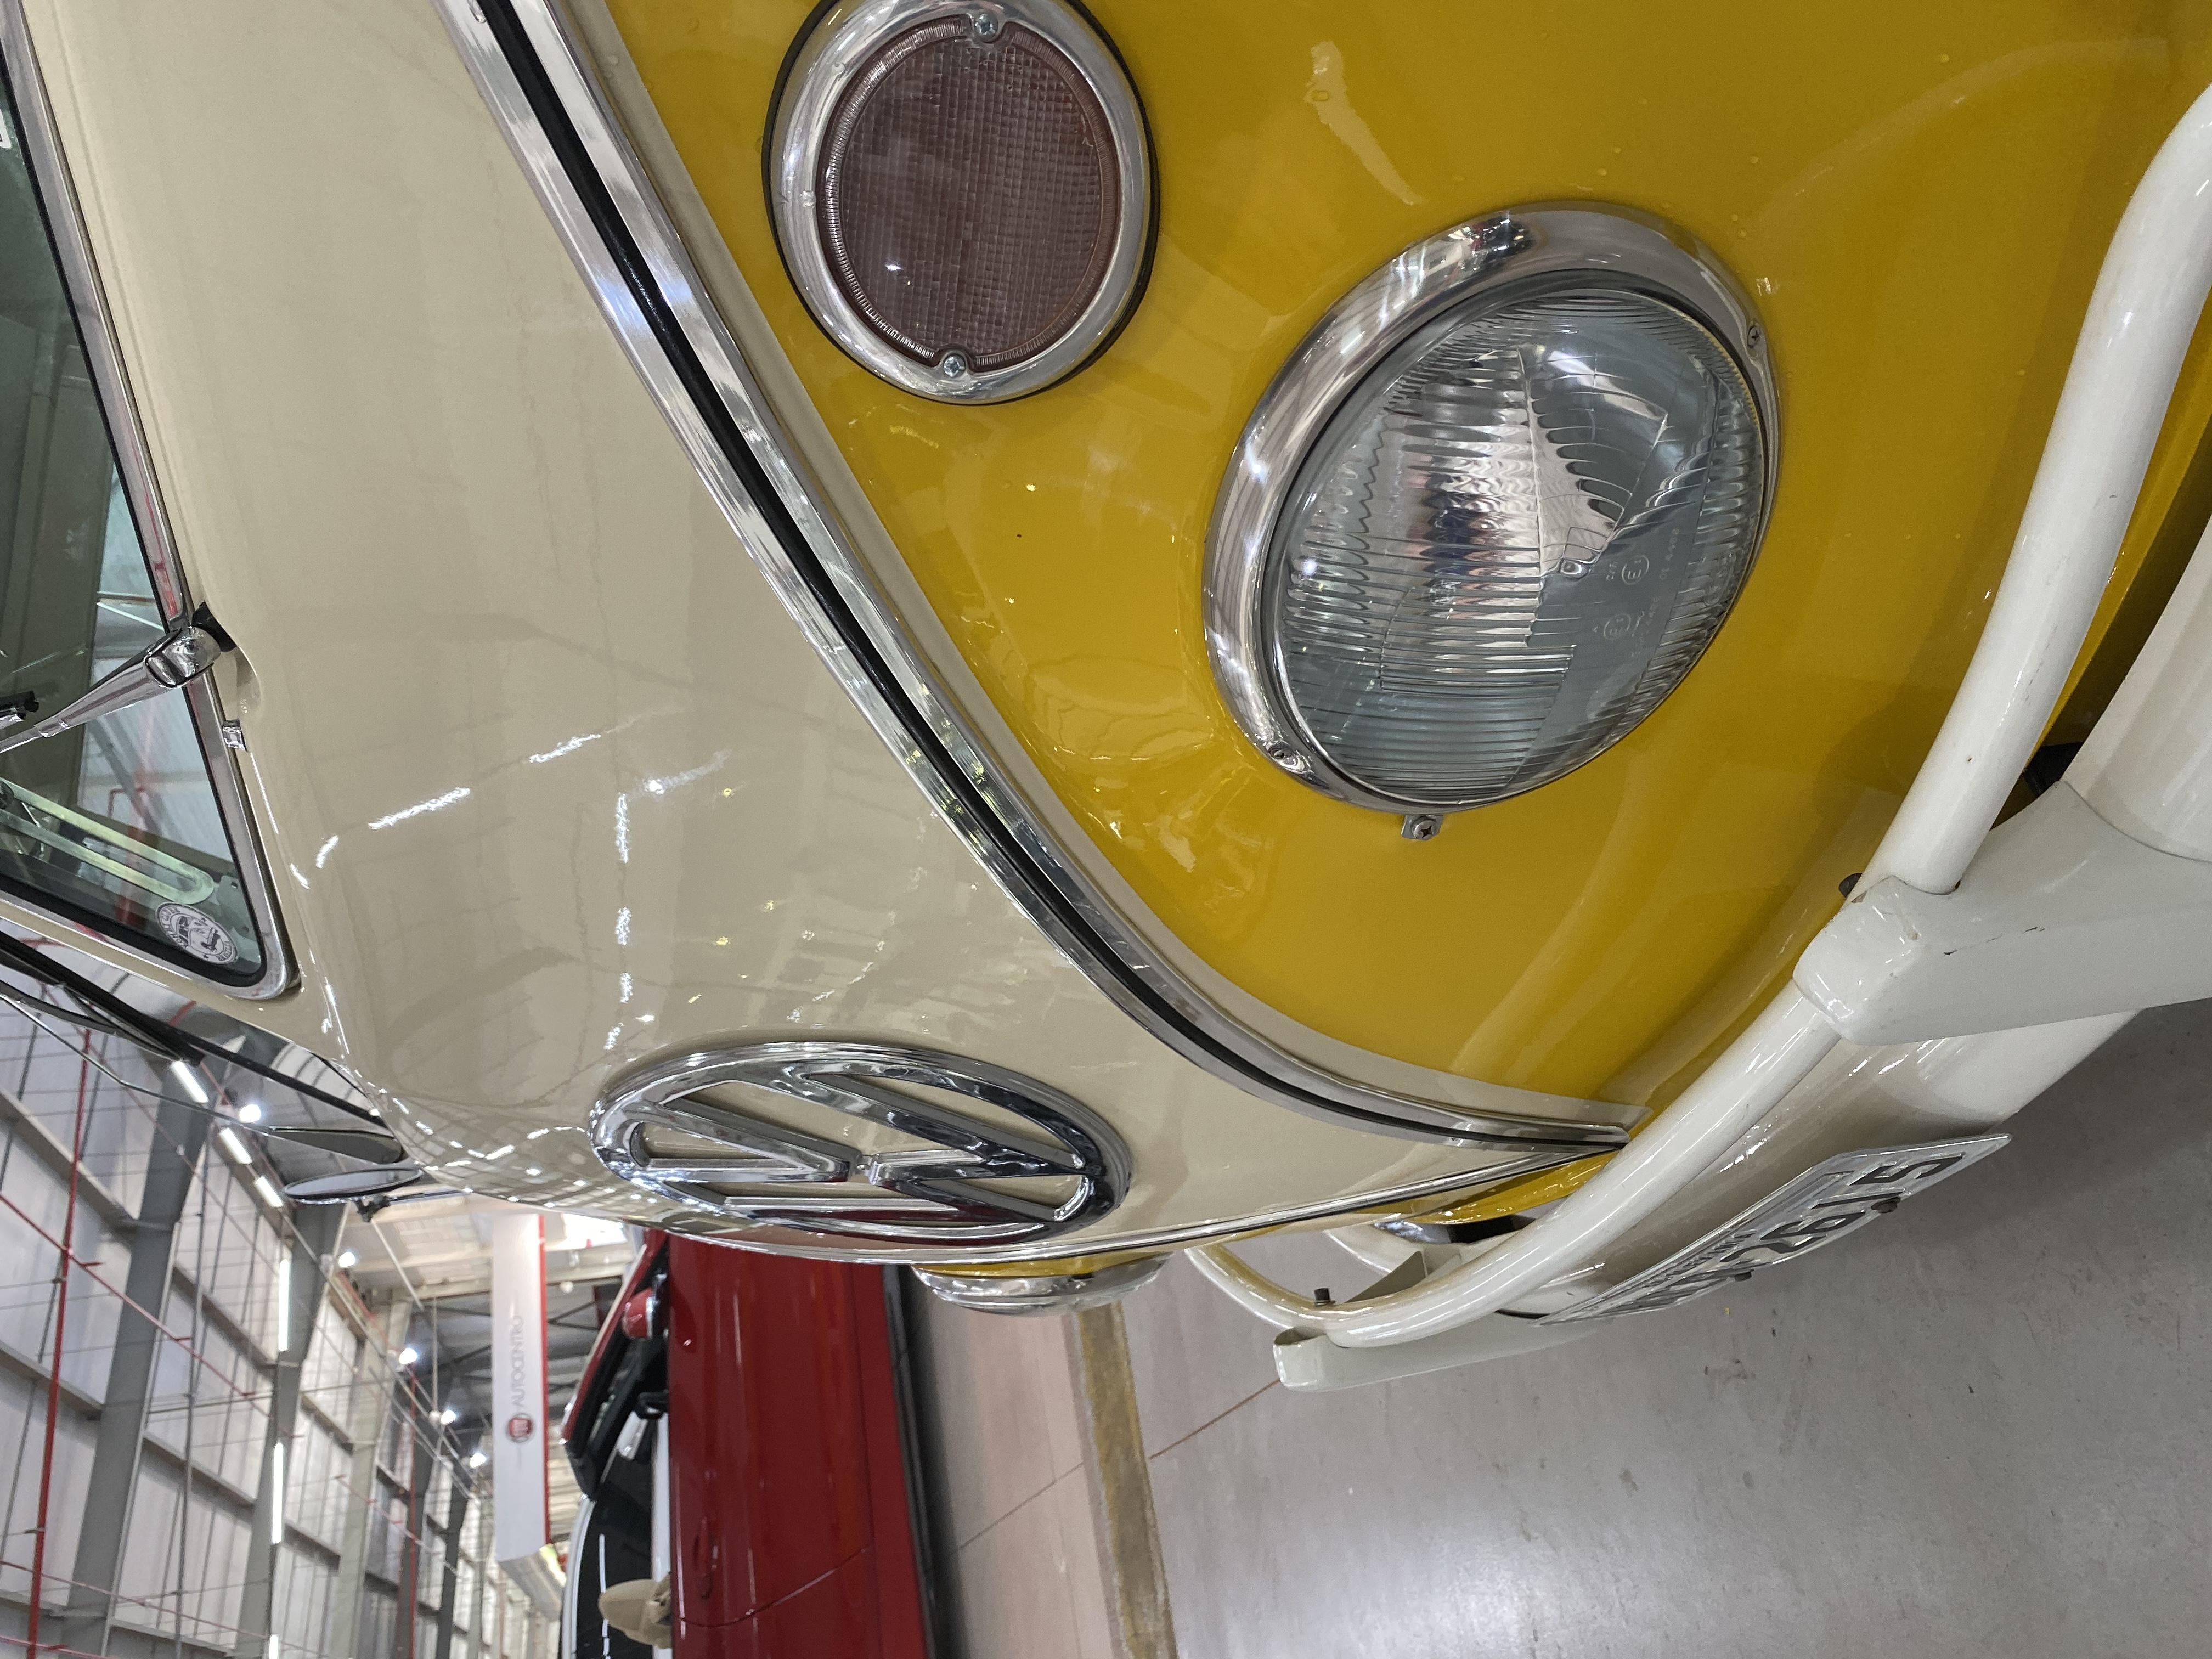 Kombi Engine Swap and Auto Restoration Service